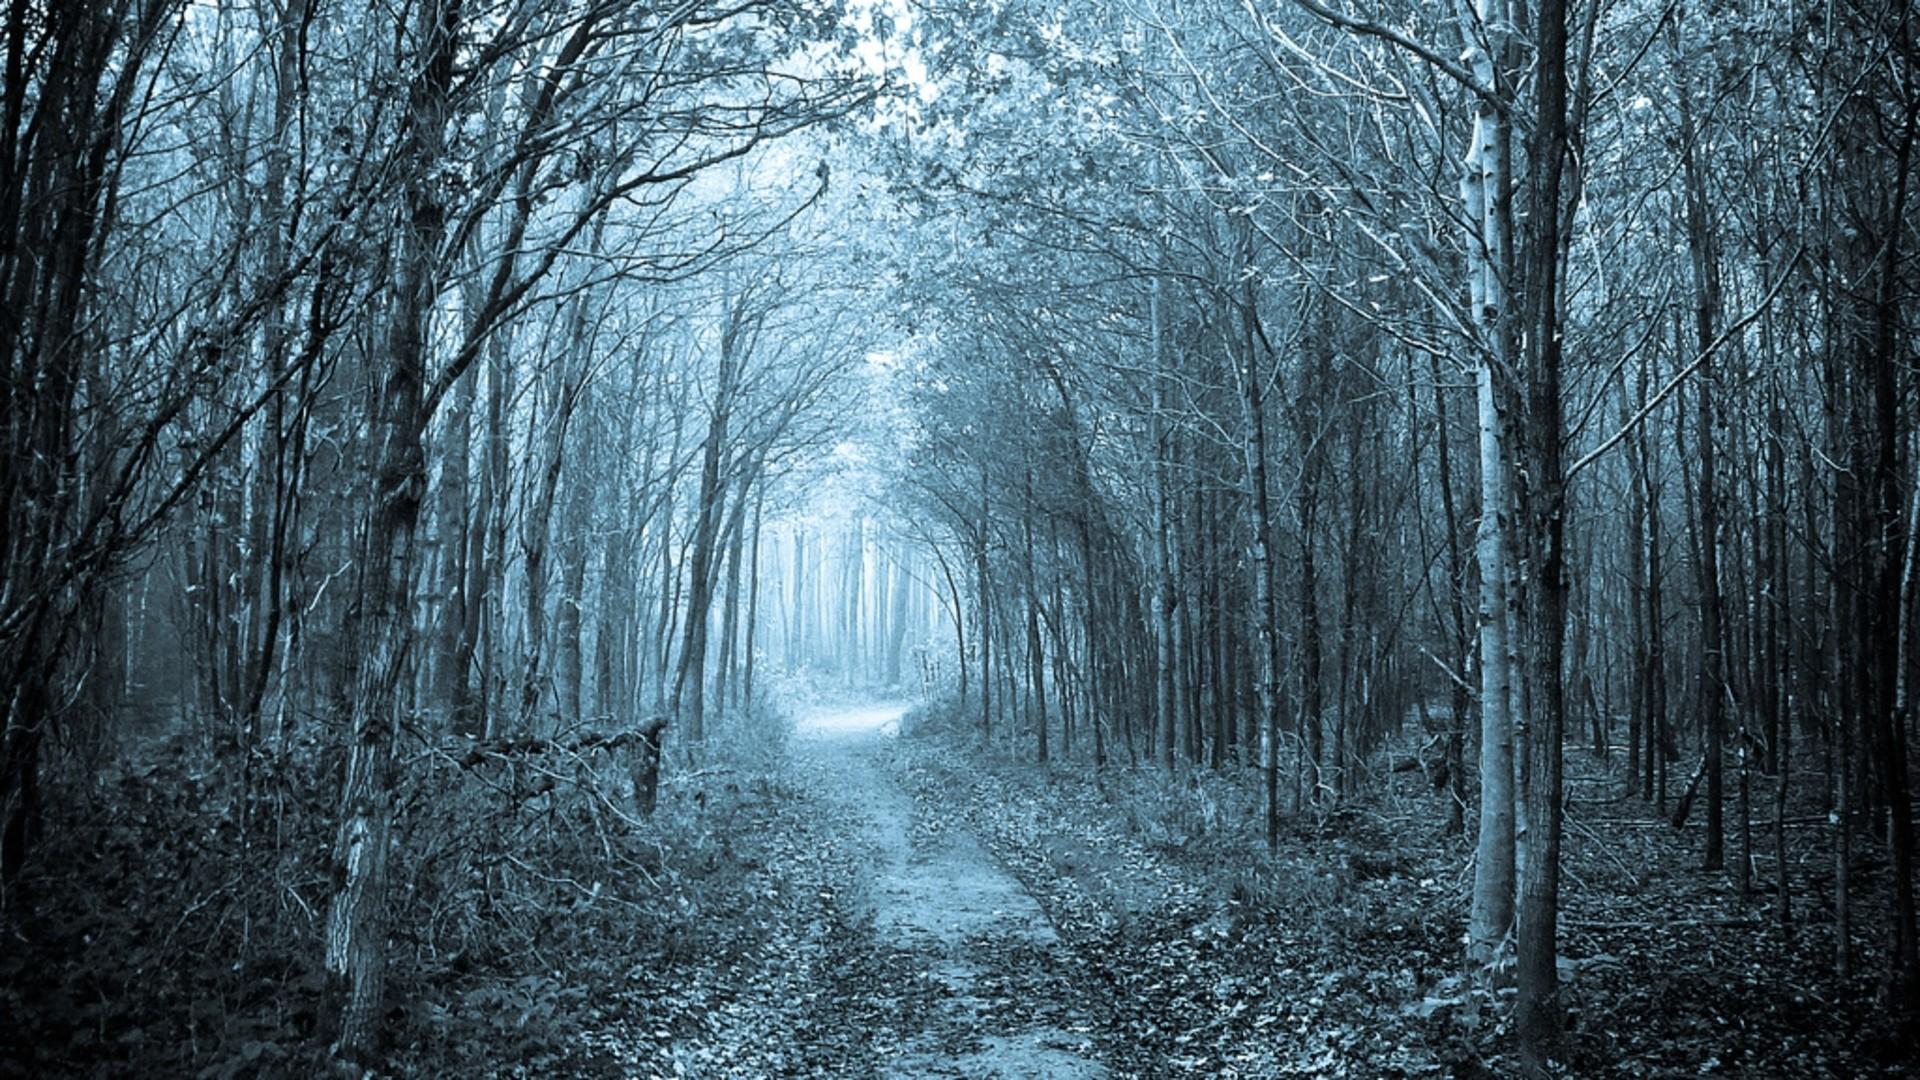 Path Through The Forest Wallpaper Background #em1t6y px 1.81 MB  Nature & Landscape